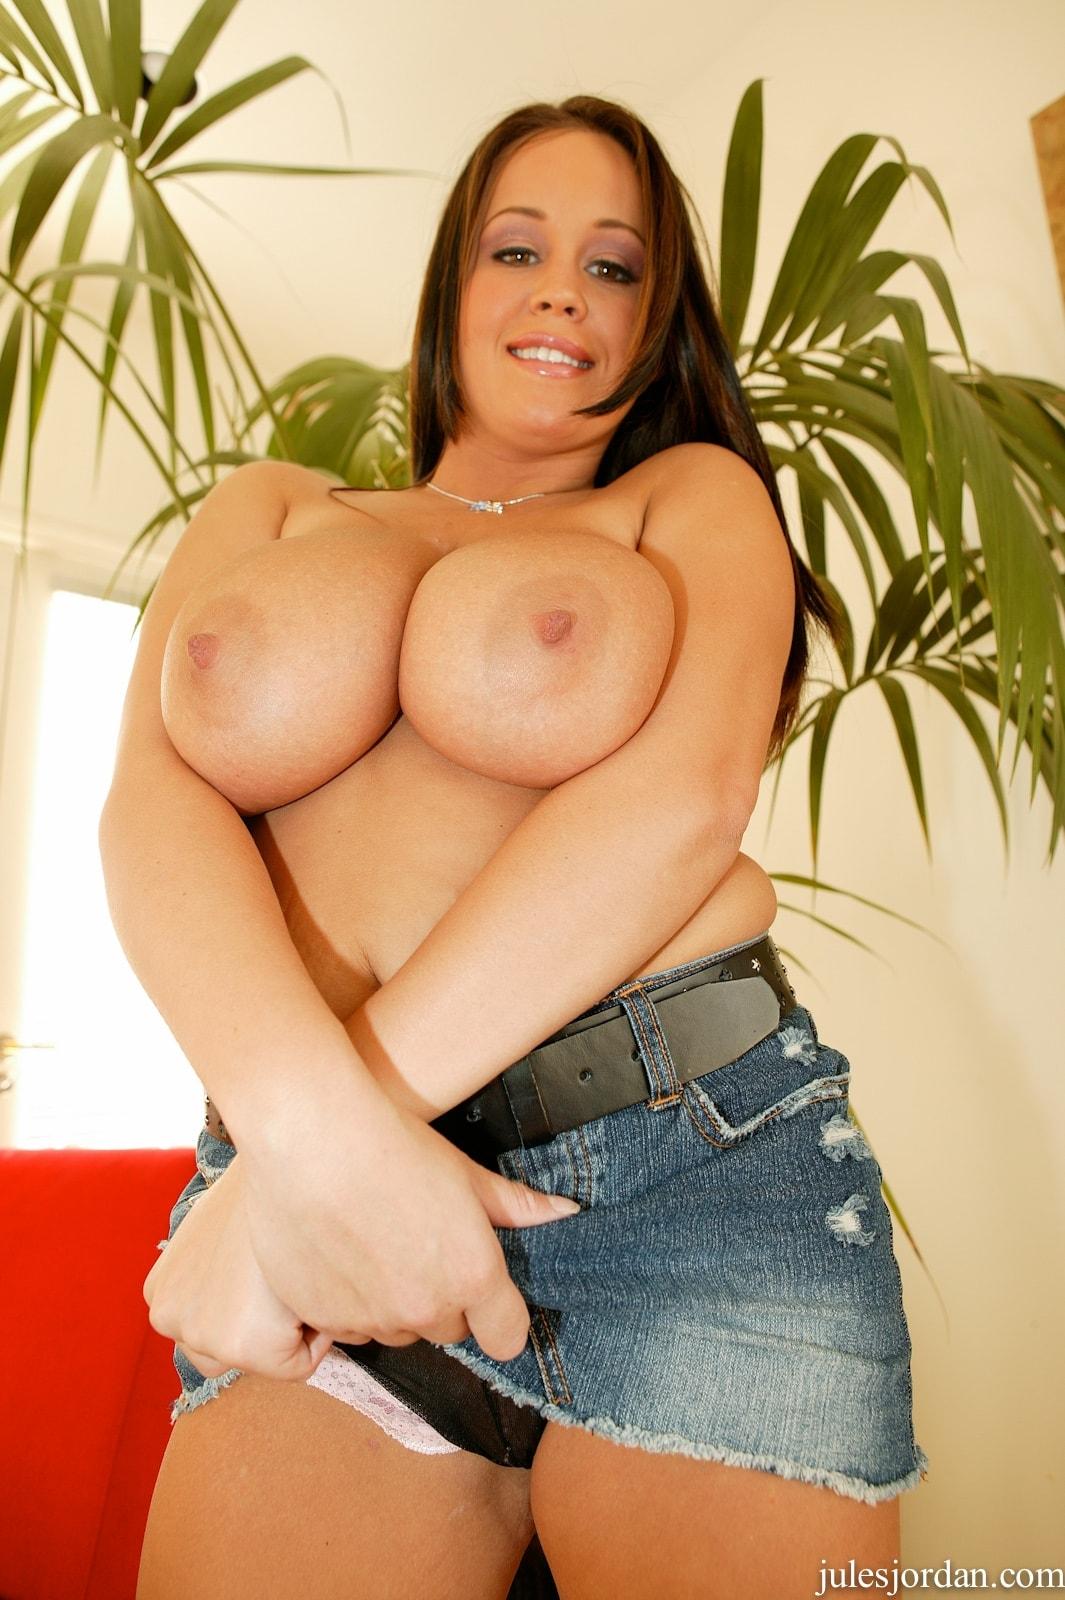 Jules Jordan 'Natural Big Tits' starring Brandy Taylor (Photo 4)